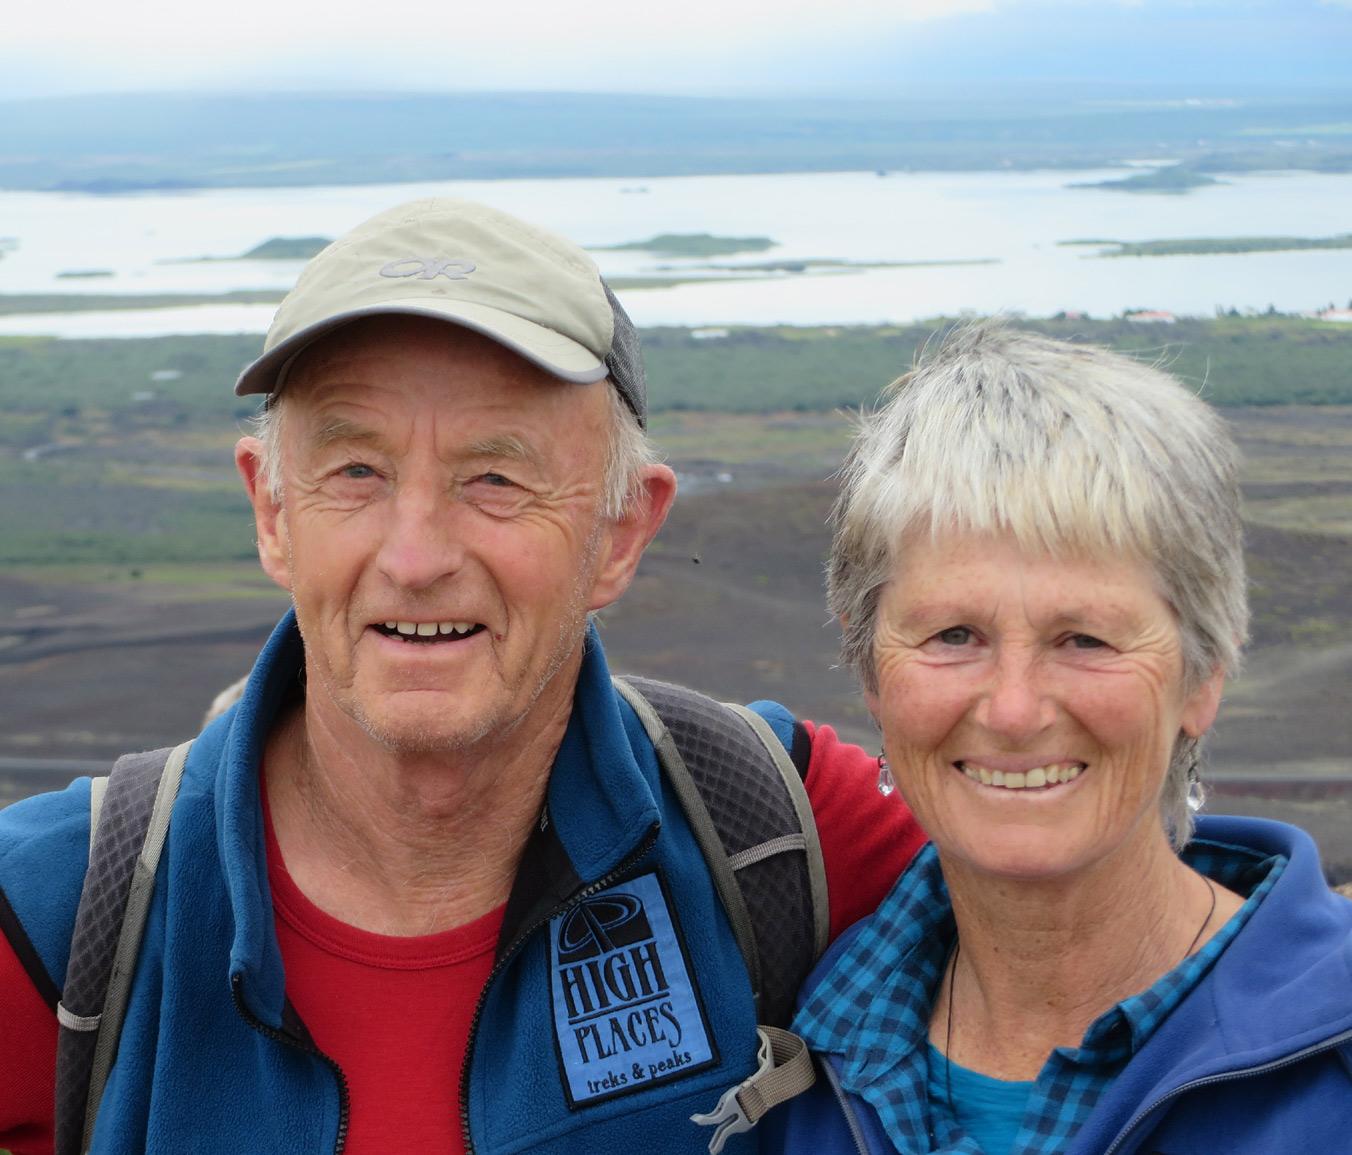 Bob & Mary Lancaster of High Places Ltd NZ